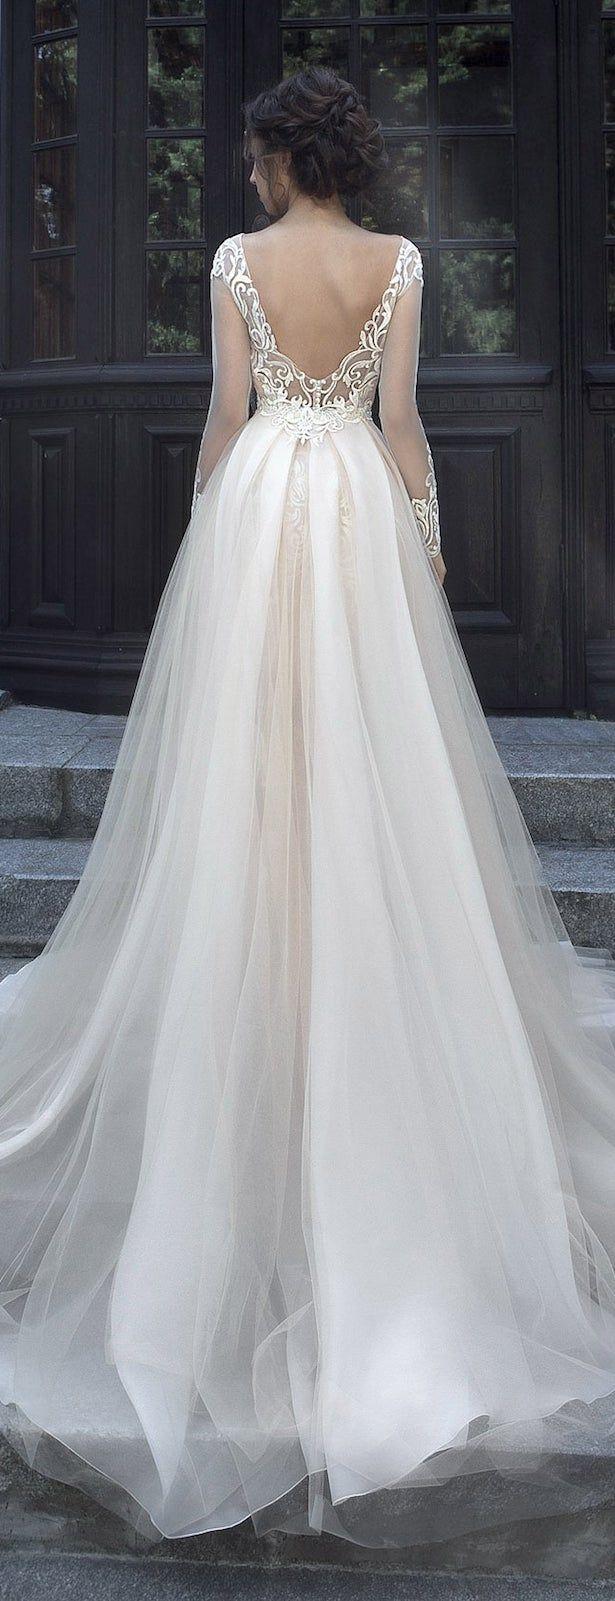 Milva wedding dresses u sunrise collection wedding dress